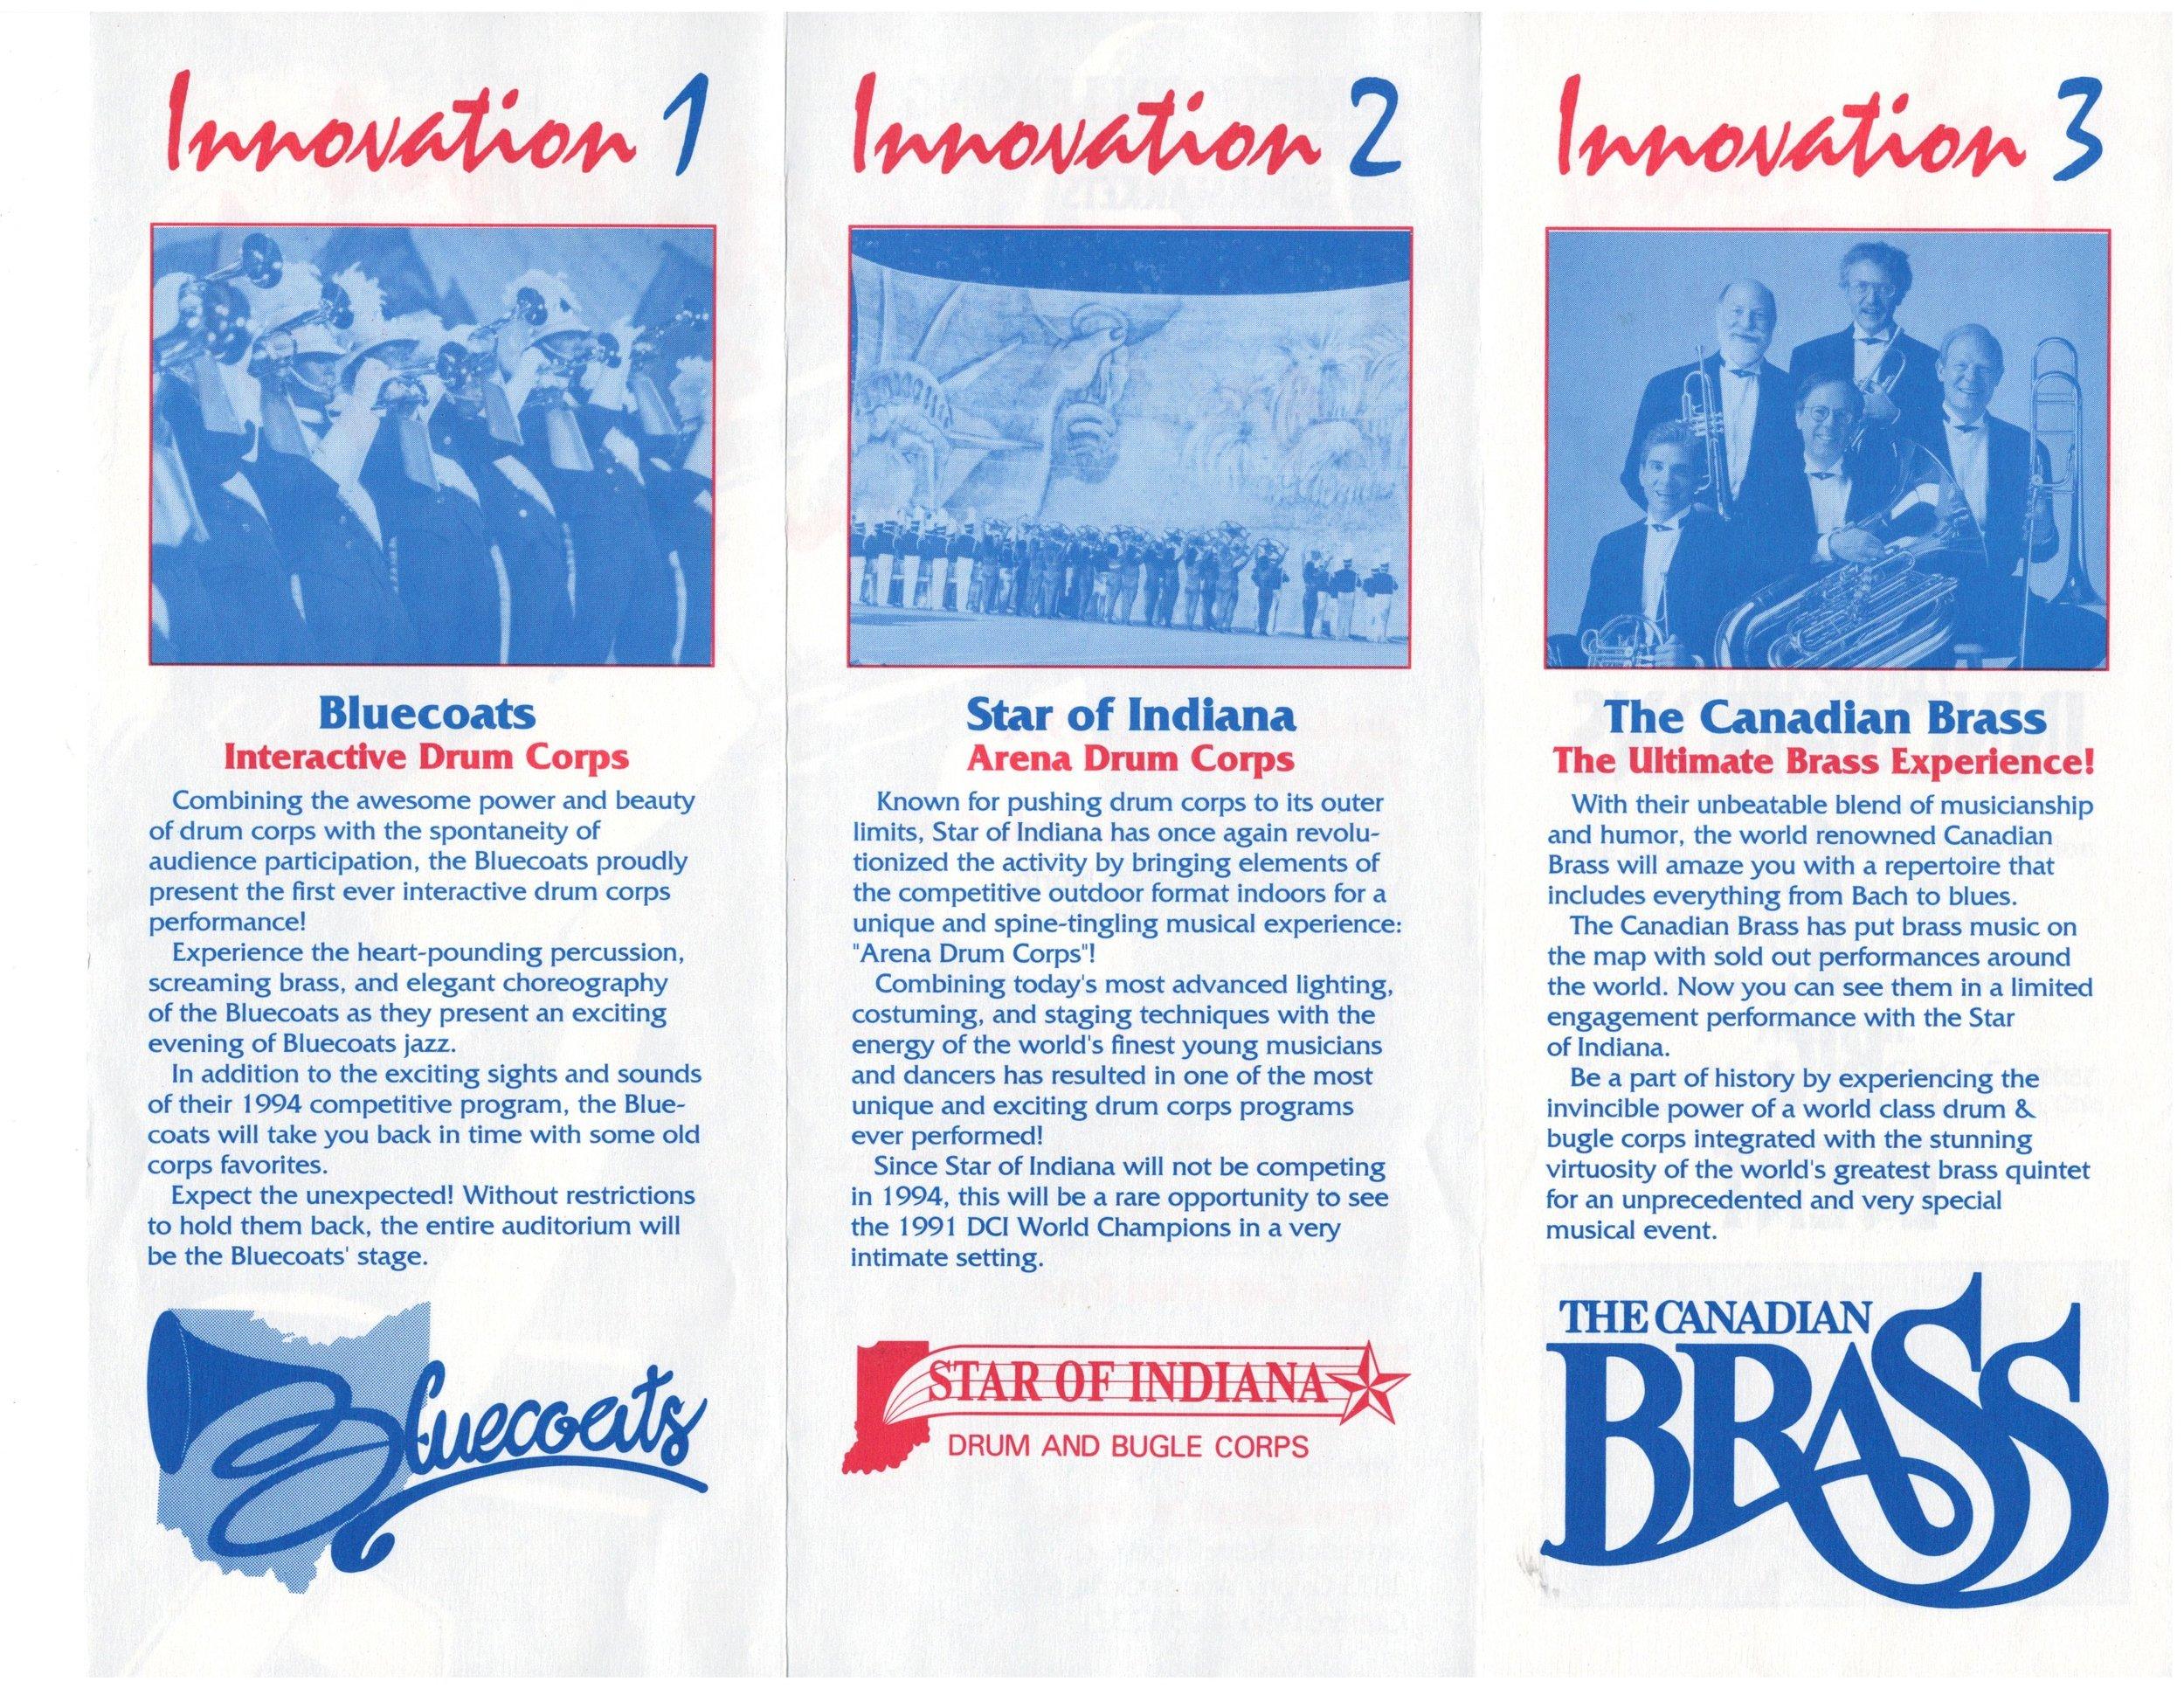 94 innovations in brass mailer inside.jpg